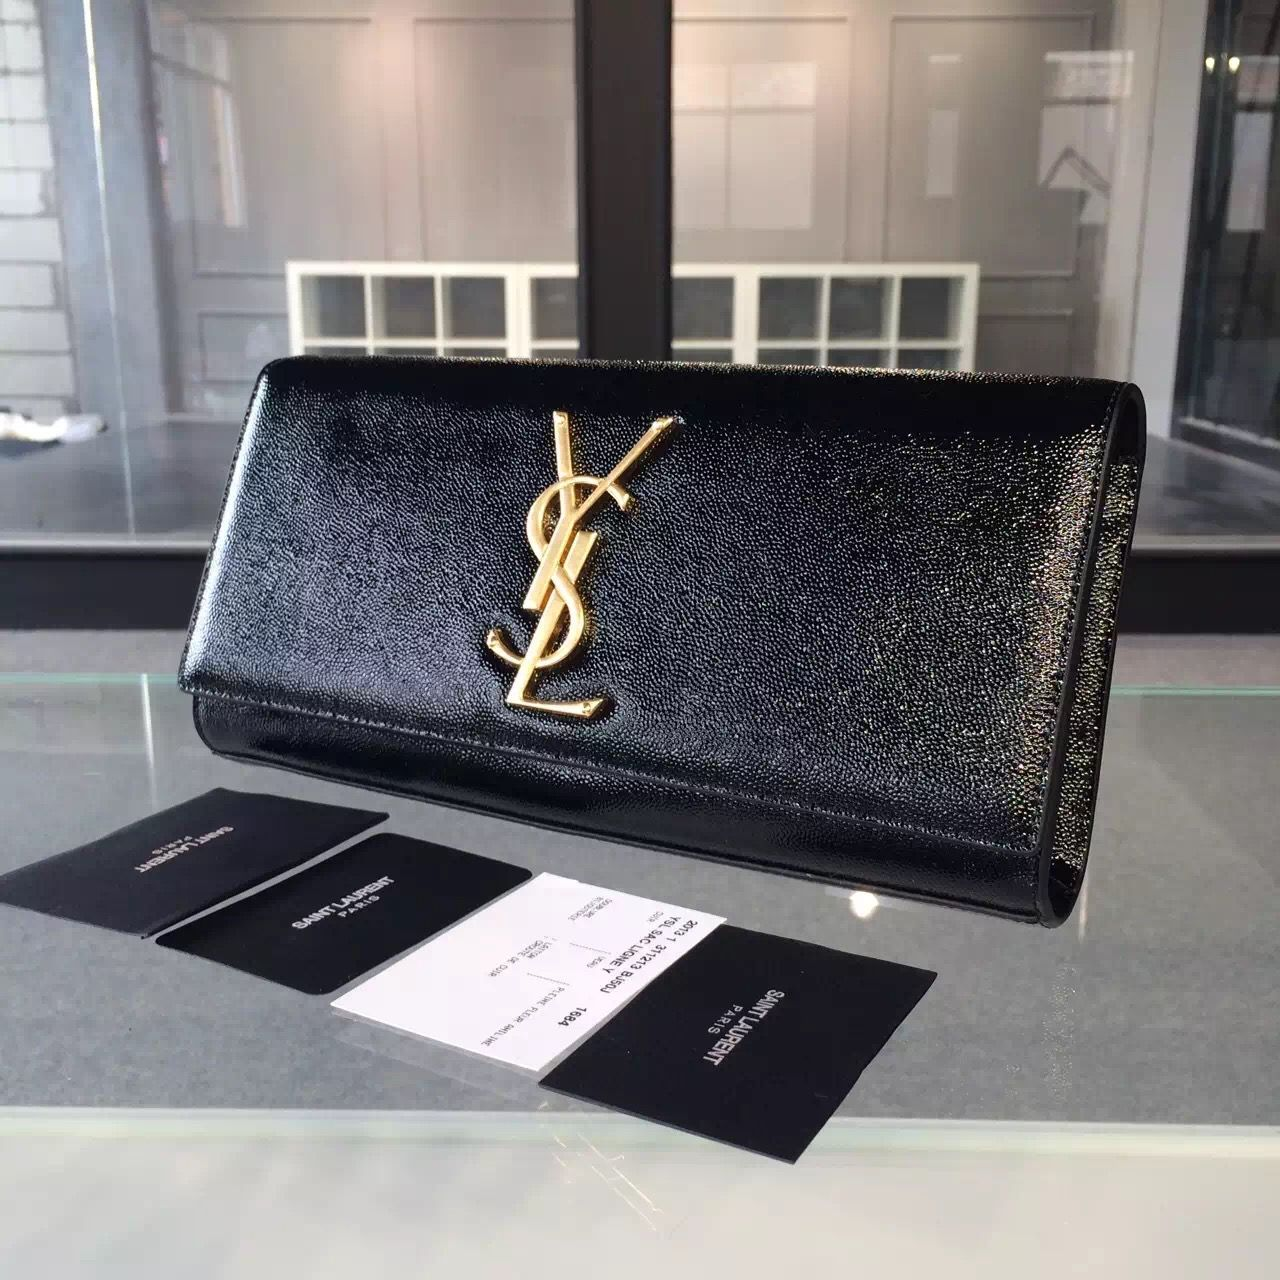 a8ea1c48bbc Saint Laurent 326079 Classic Monogram Clutch in Burgundy Crocodile Embossed  Leather | YSL Clutch Sale | Monogram clutch, Designer bags for less, Leather